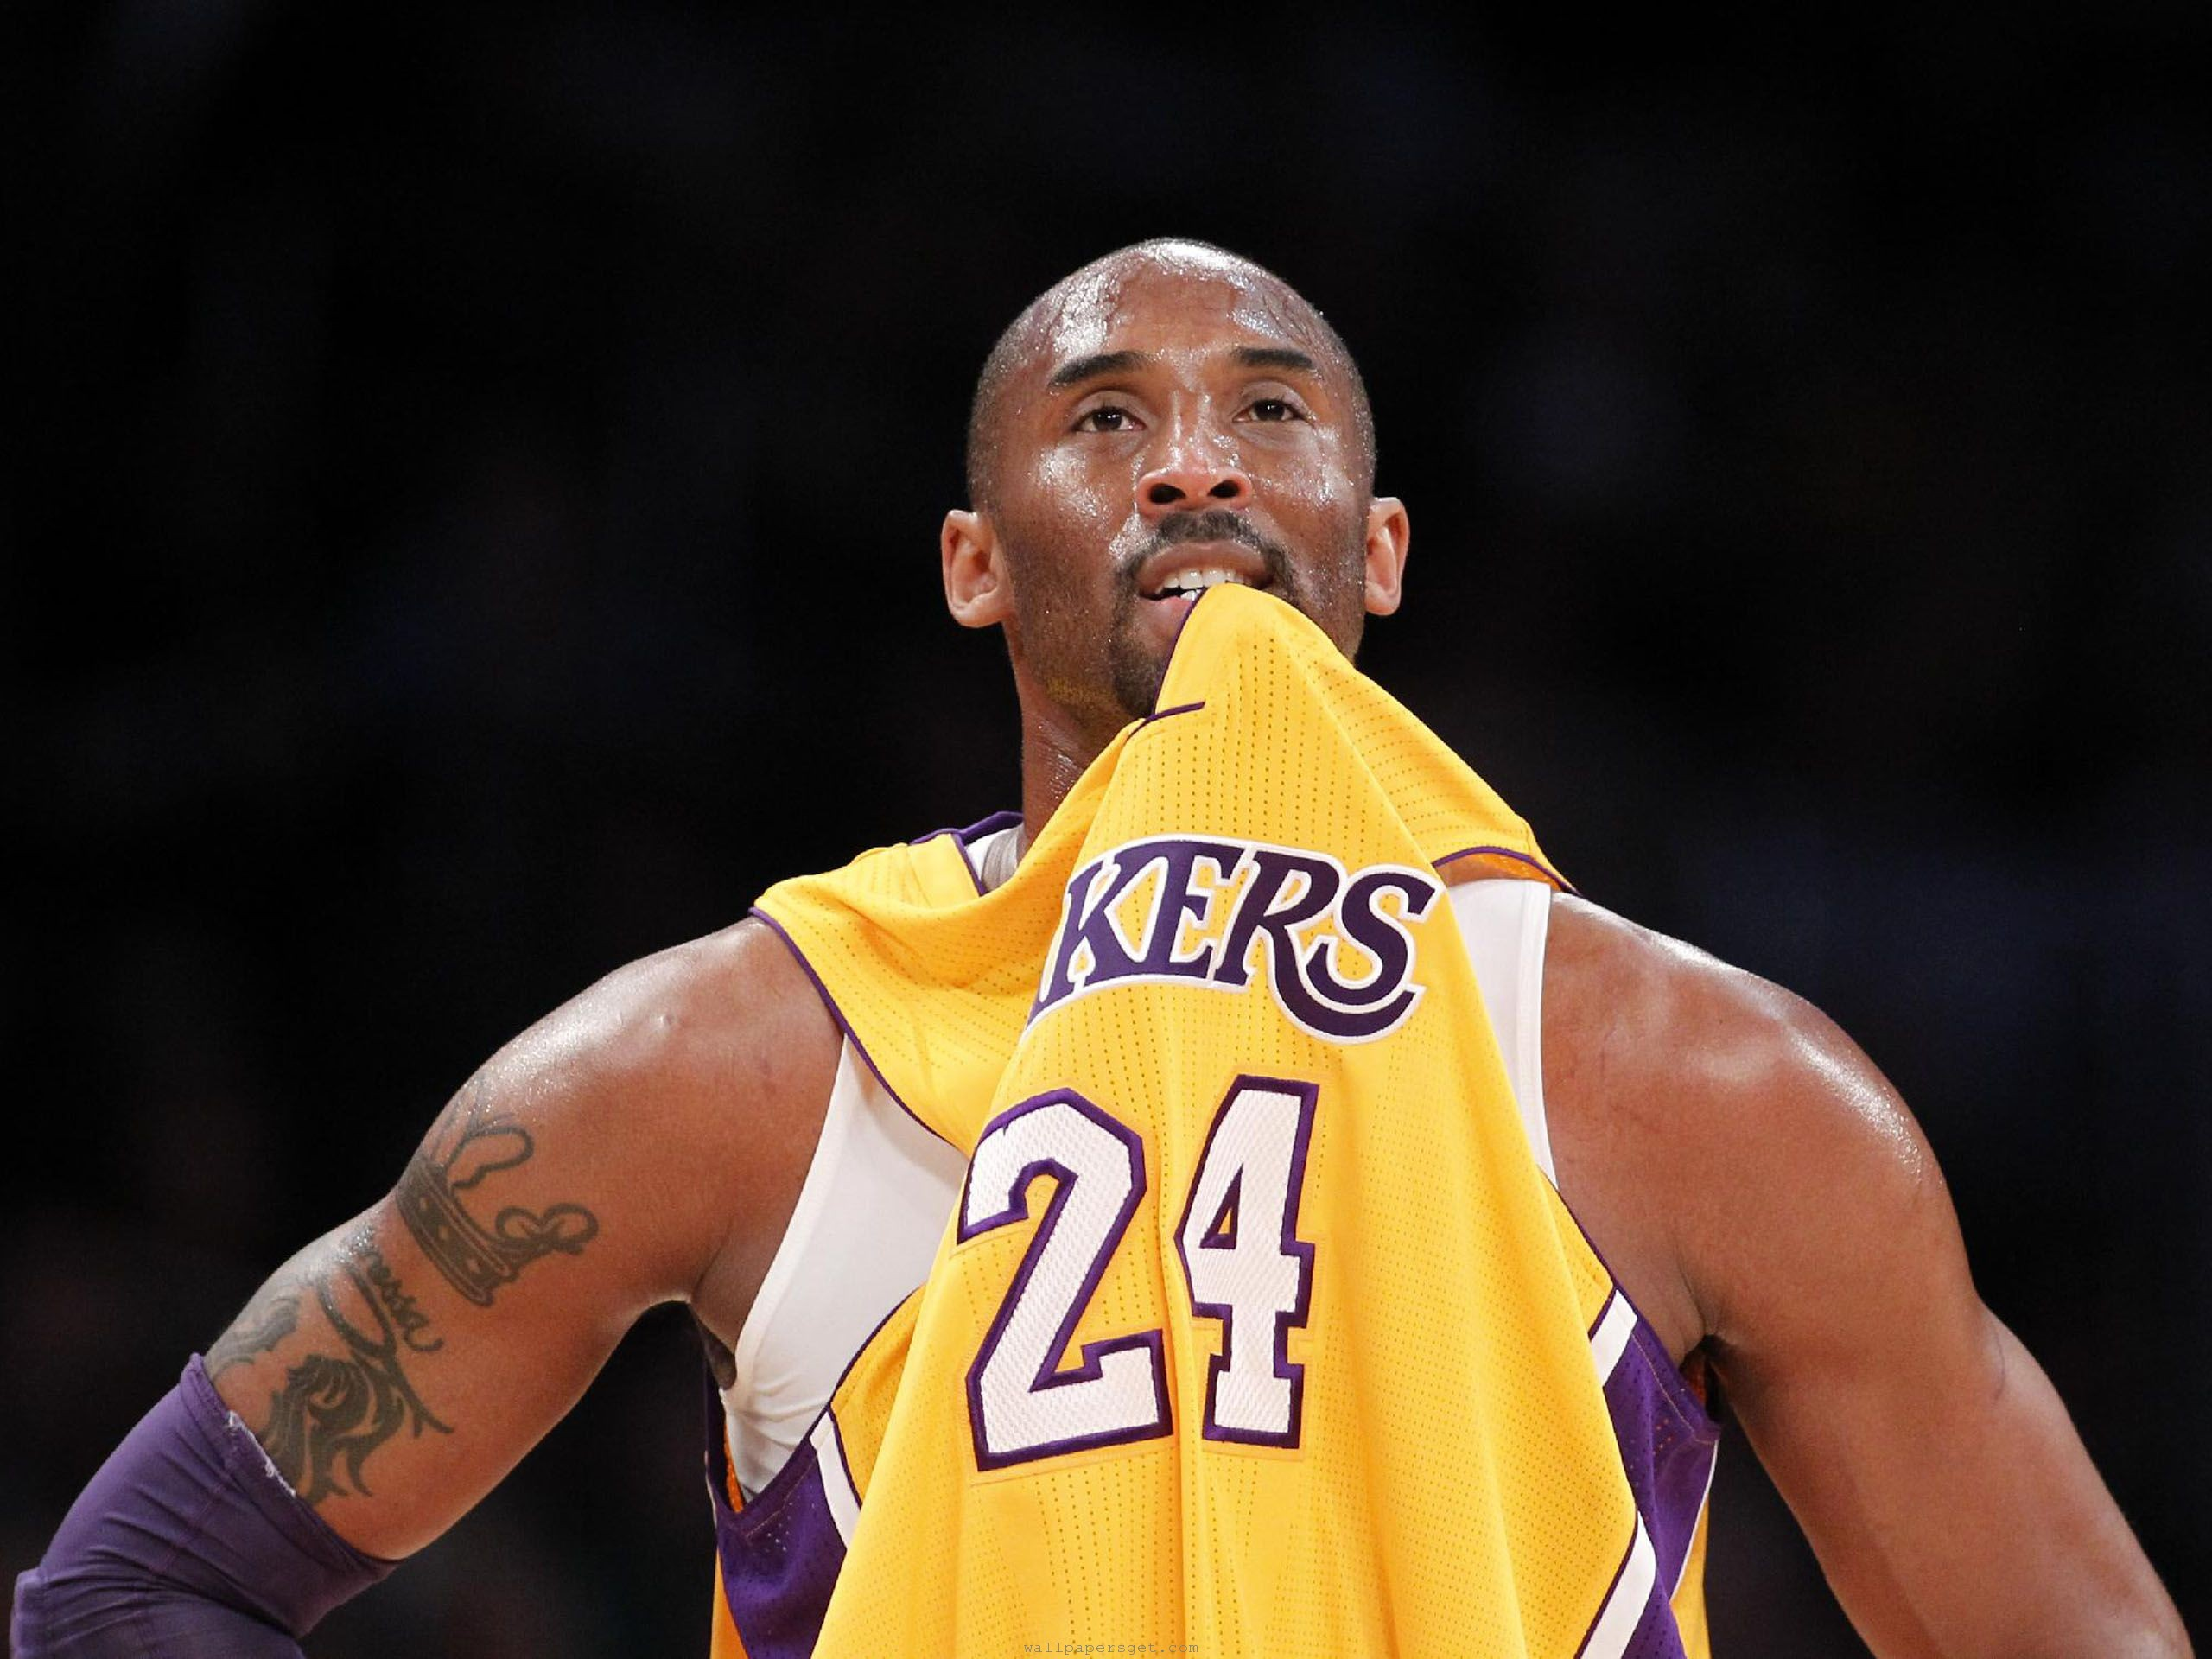 los-angeles-lakers-american-professional-basketball-kobe-bryant-black-mamba